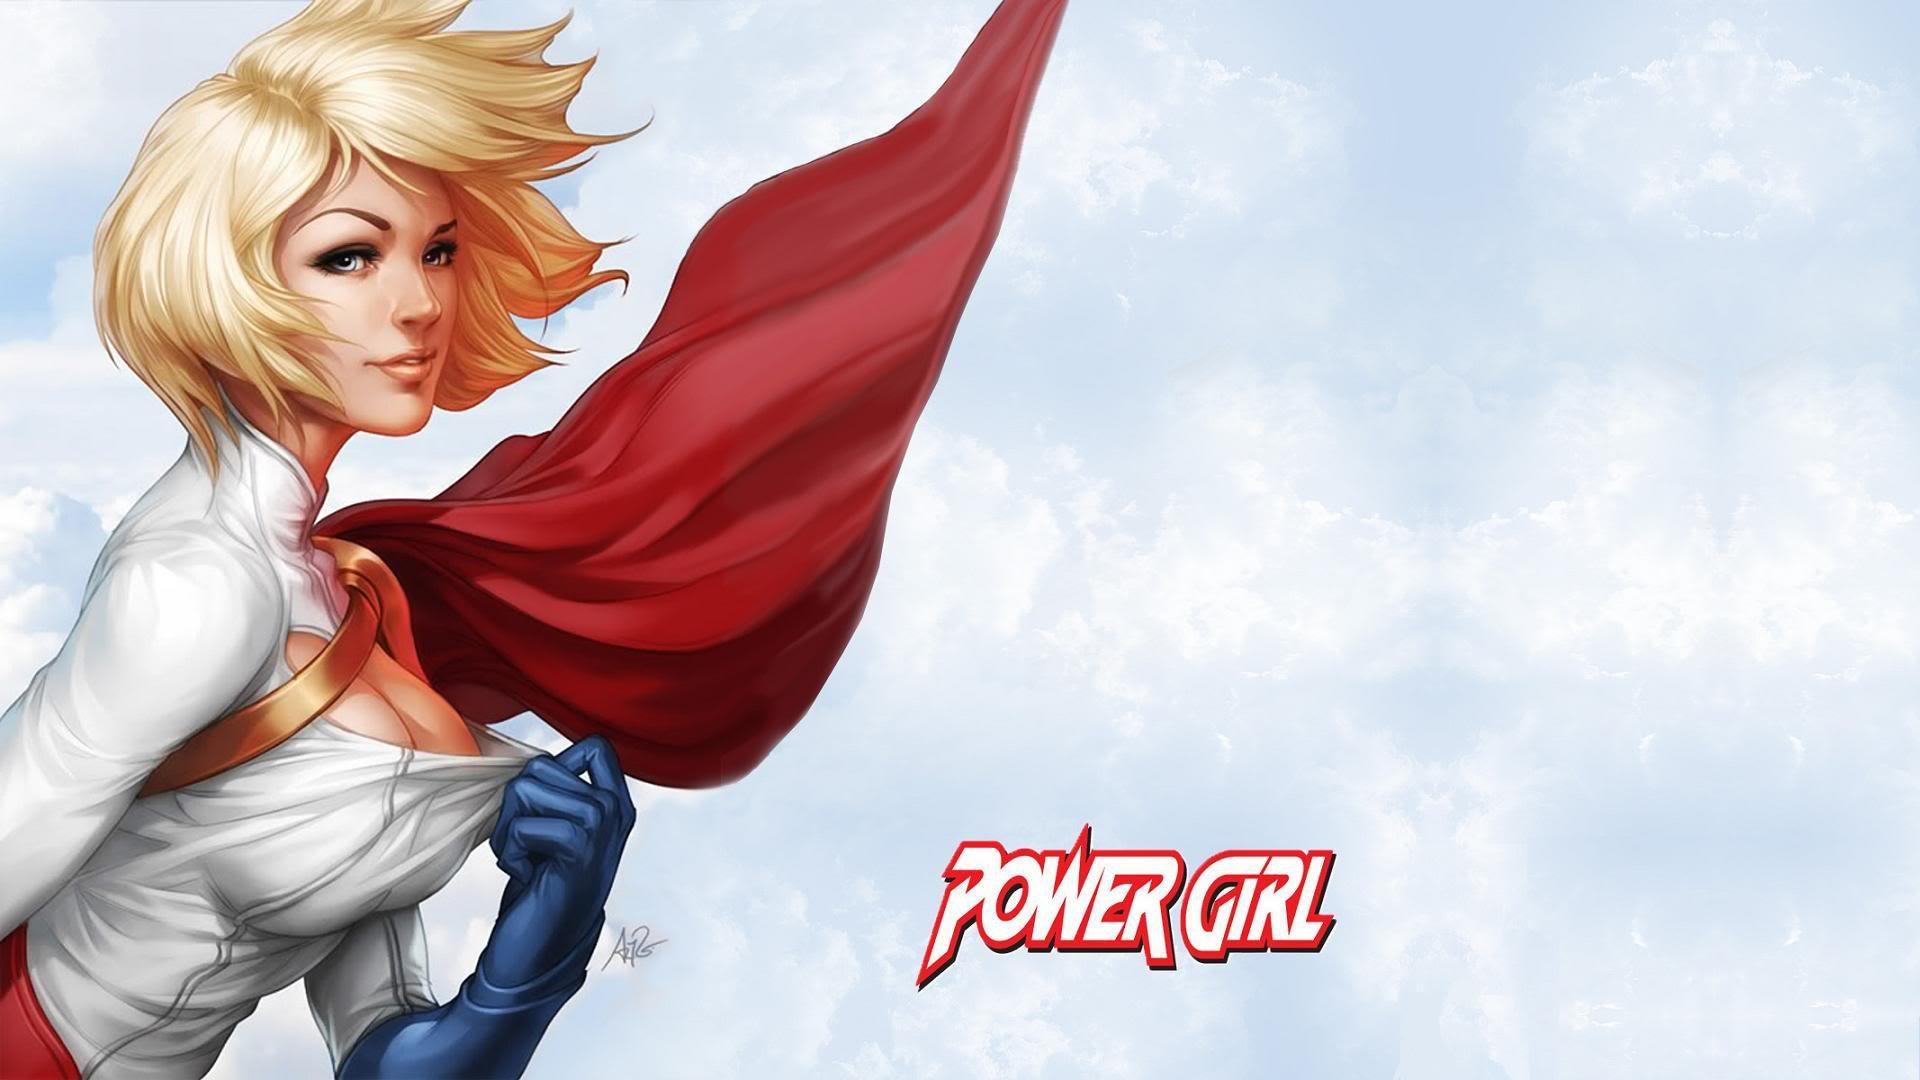 powergirl dc comics wallpaper 1920x1080 482235 wallpaperup